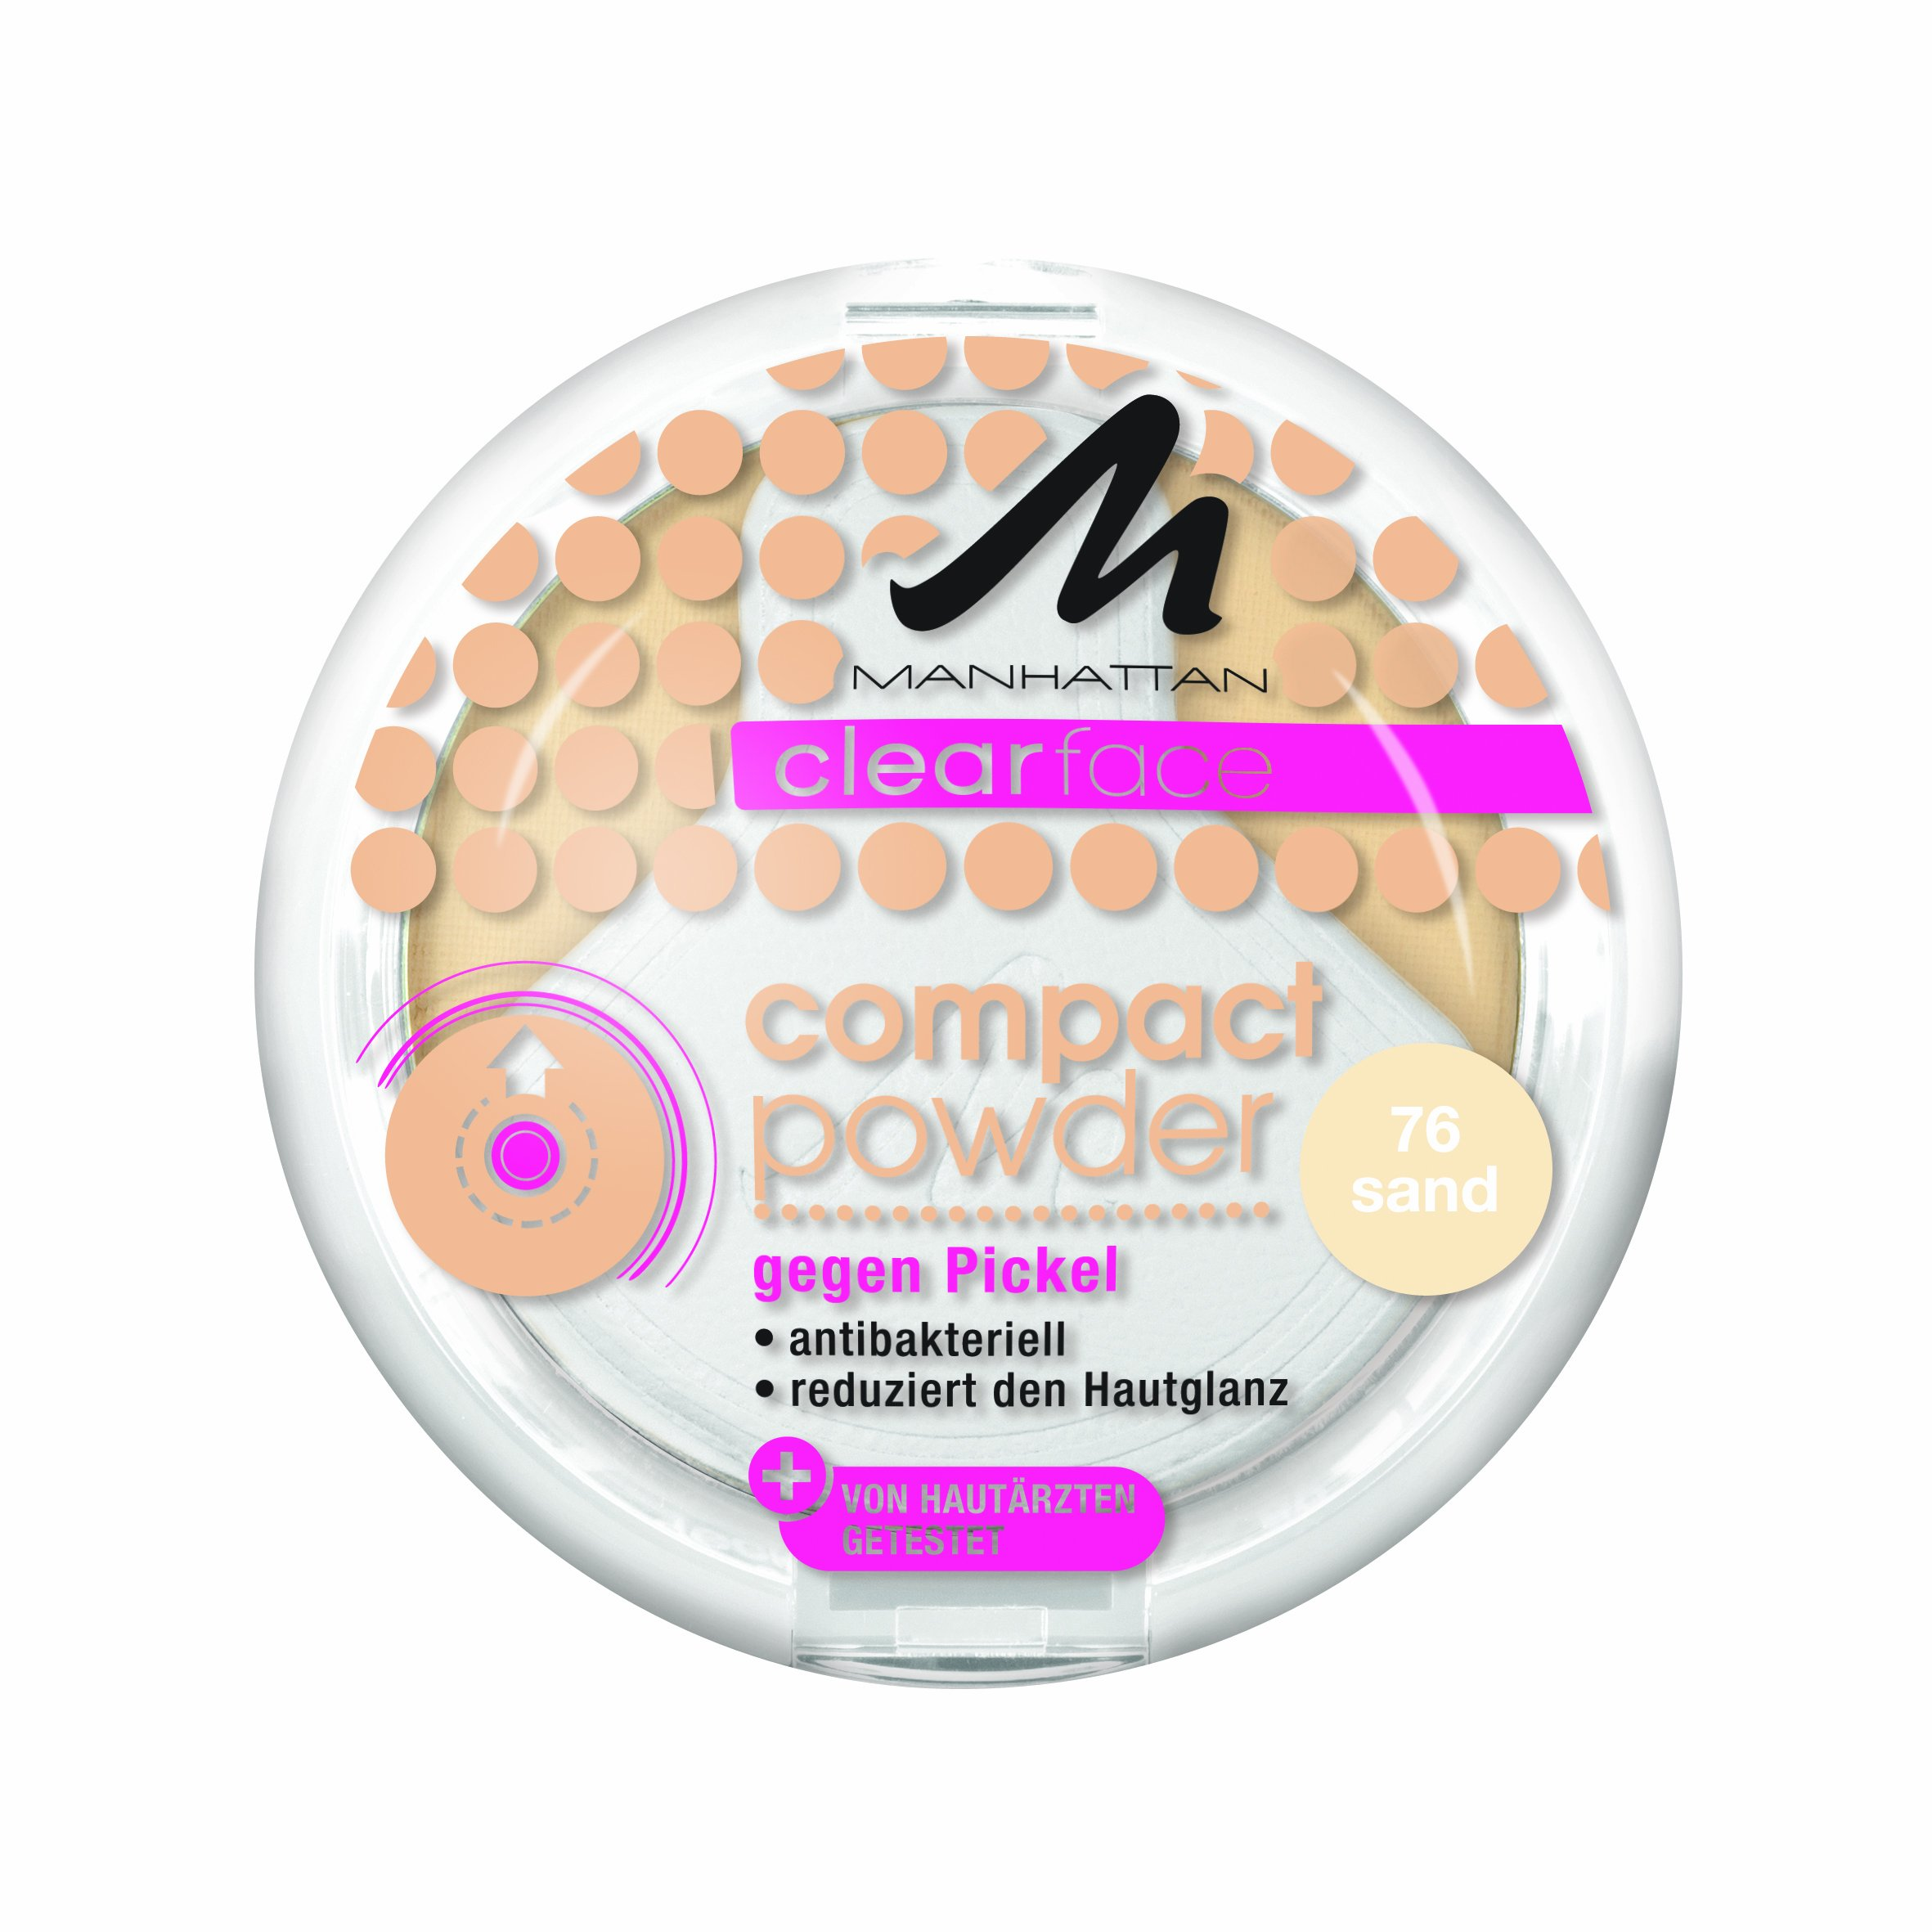 Manhattan CF Compact Powder 76 1er Pack (1 x 9 g) product image